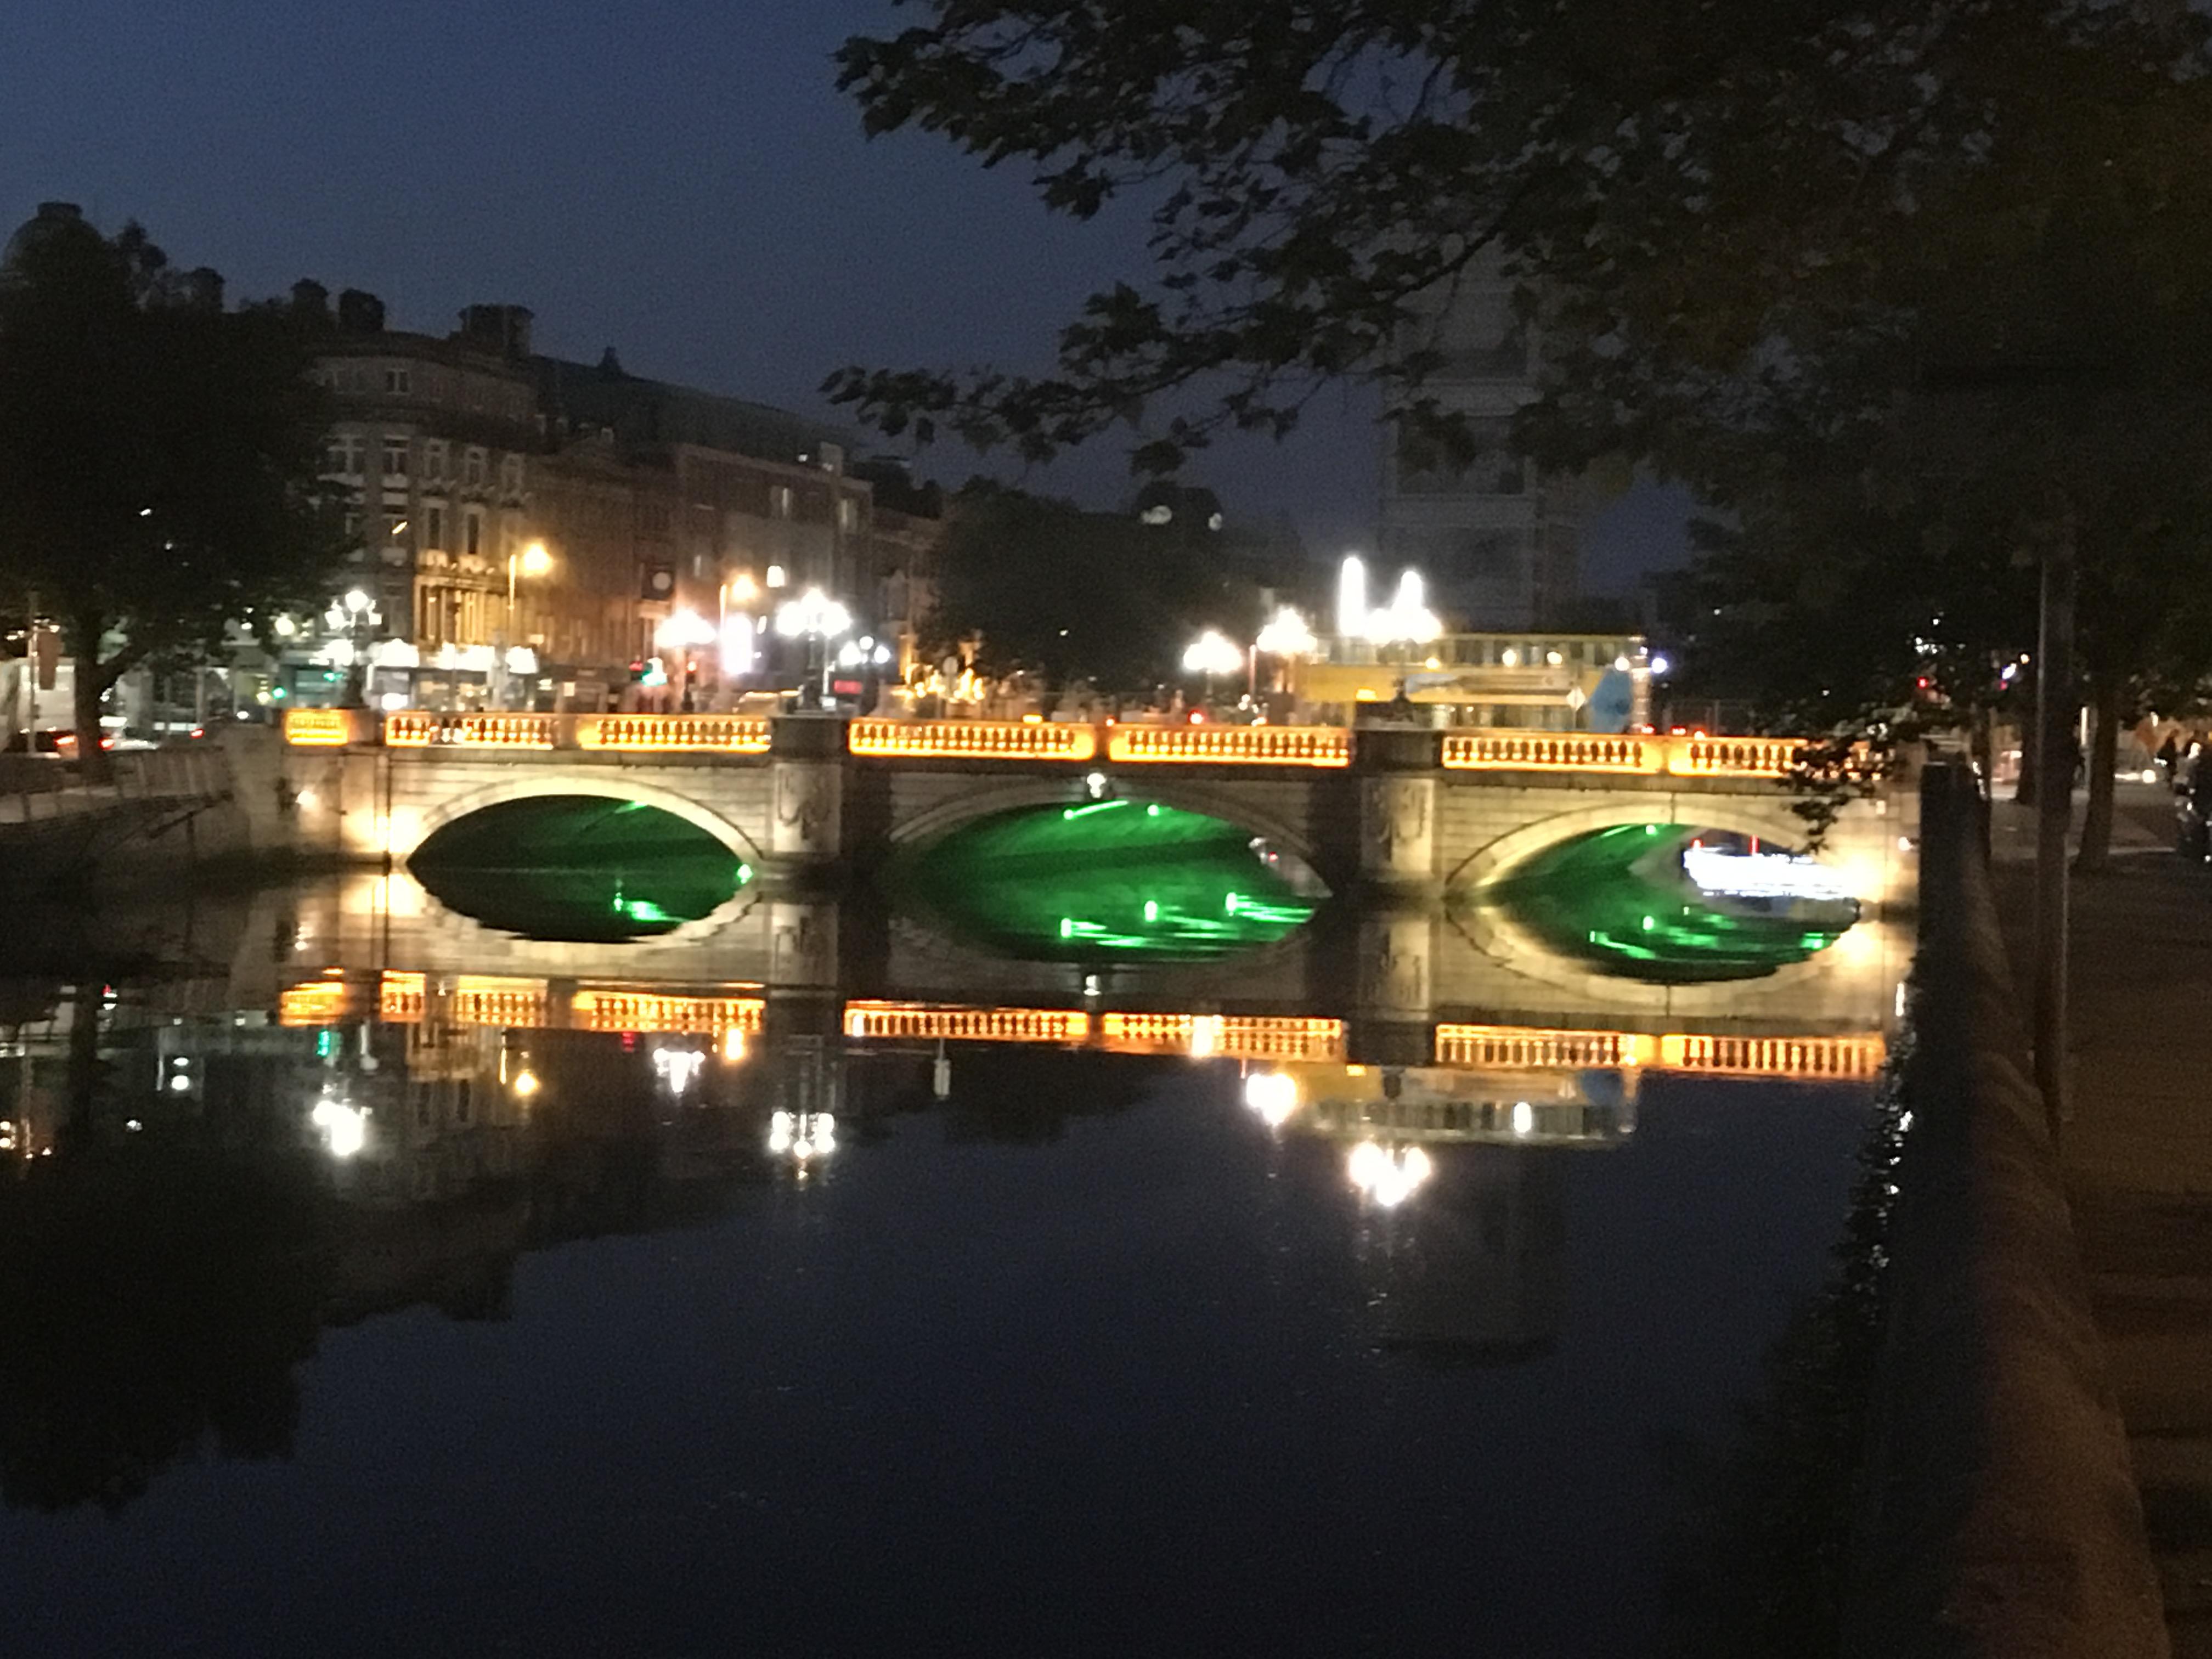 A picture of an illuminated bridge in Dublin.